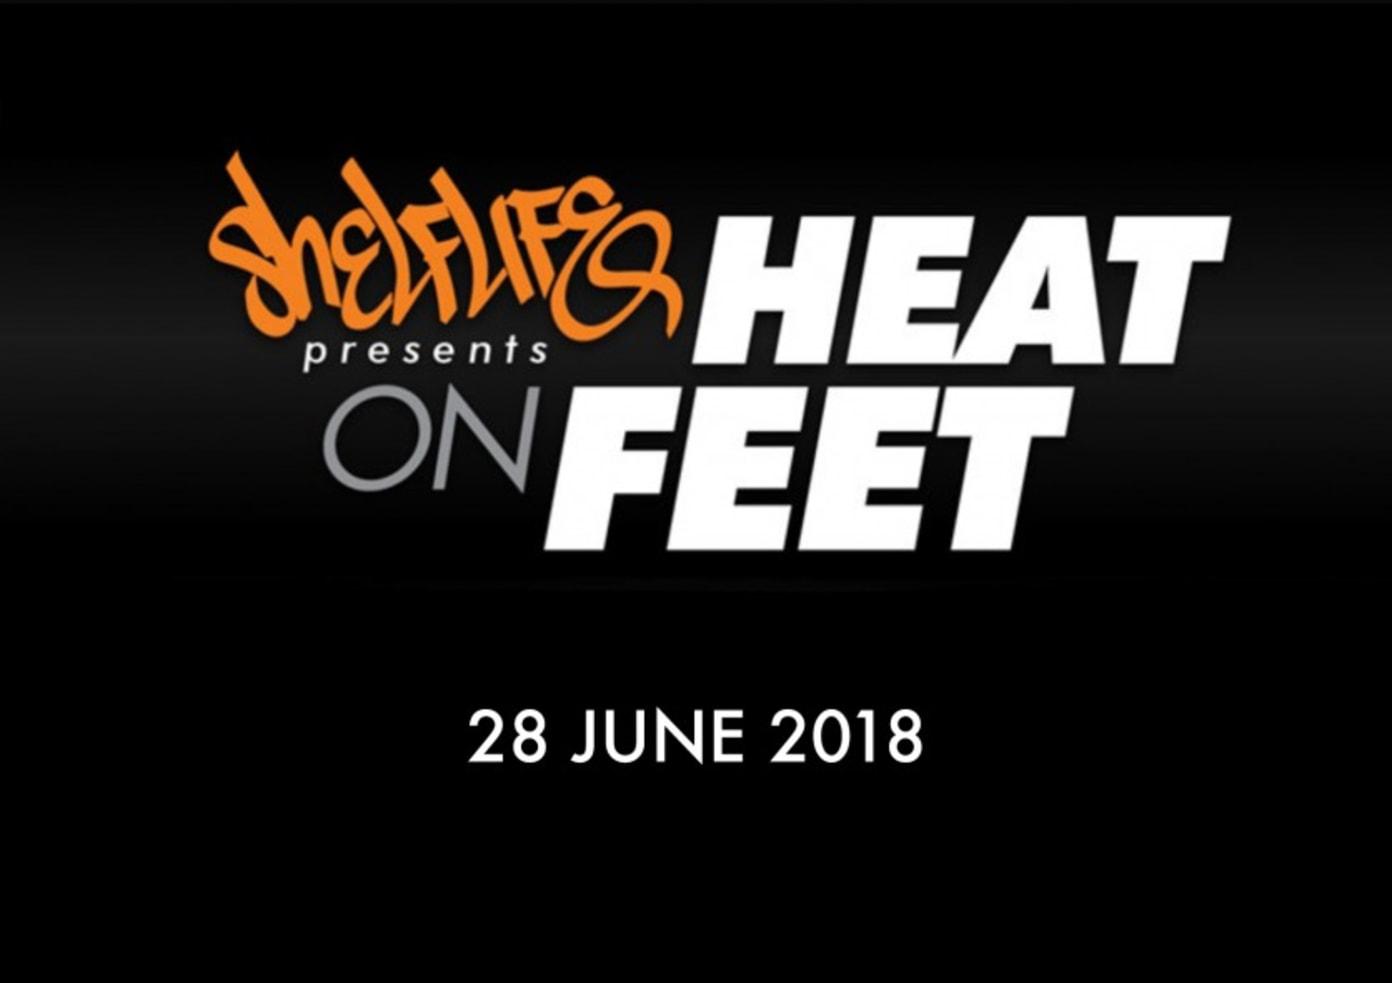 #SLHEAT: 28 June 2018